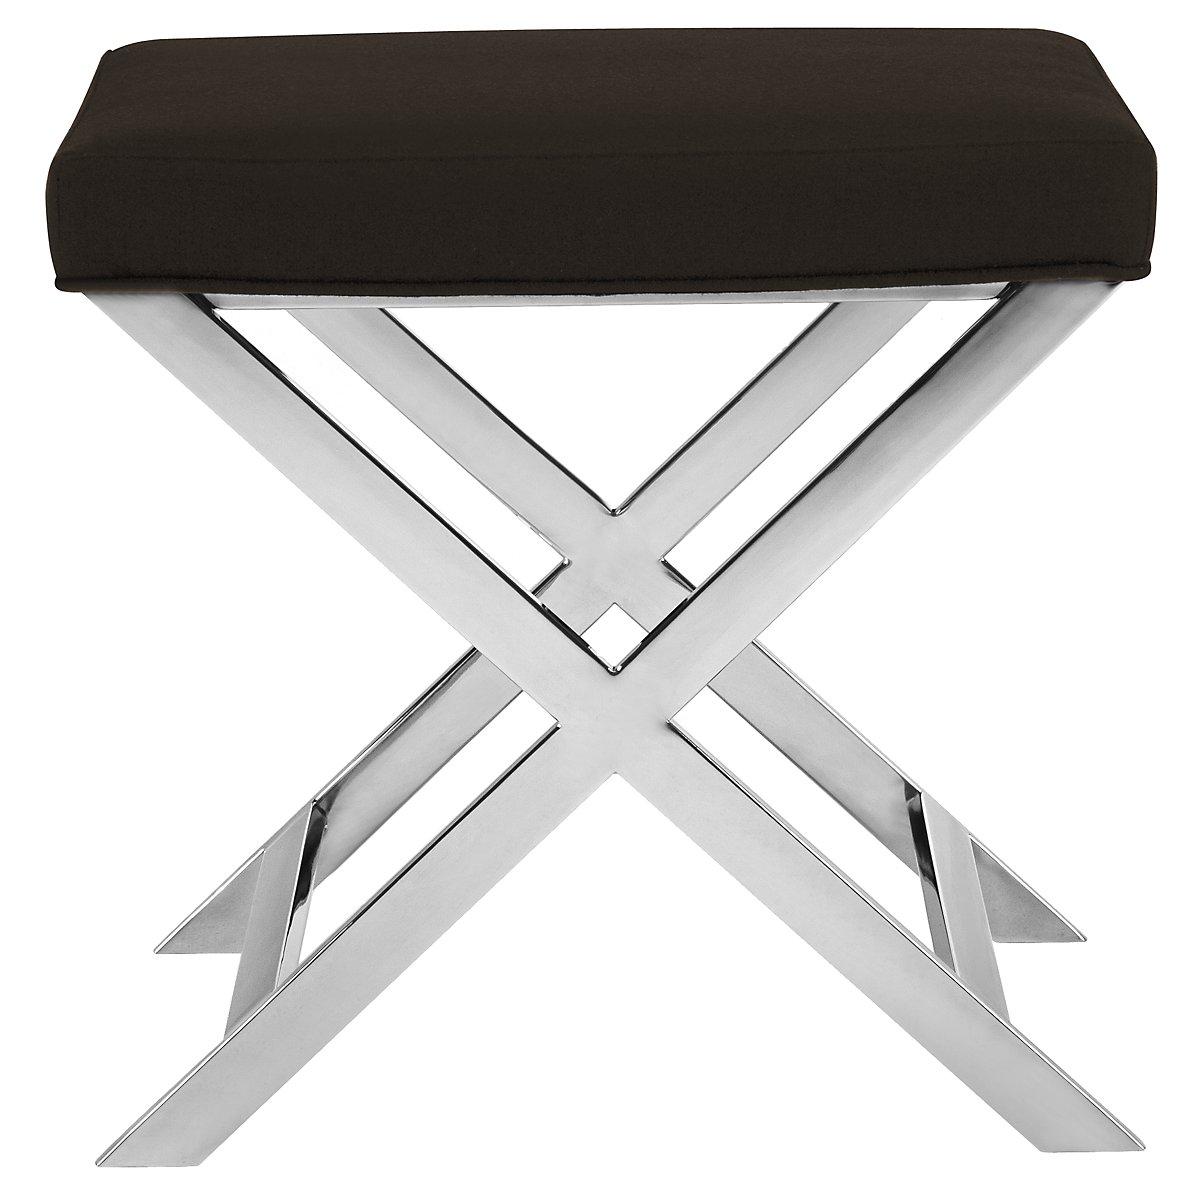 Campion Black Upholstered Stool